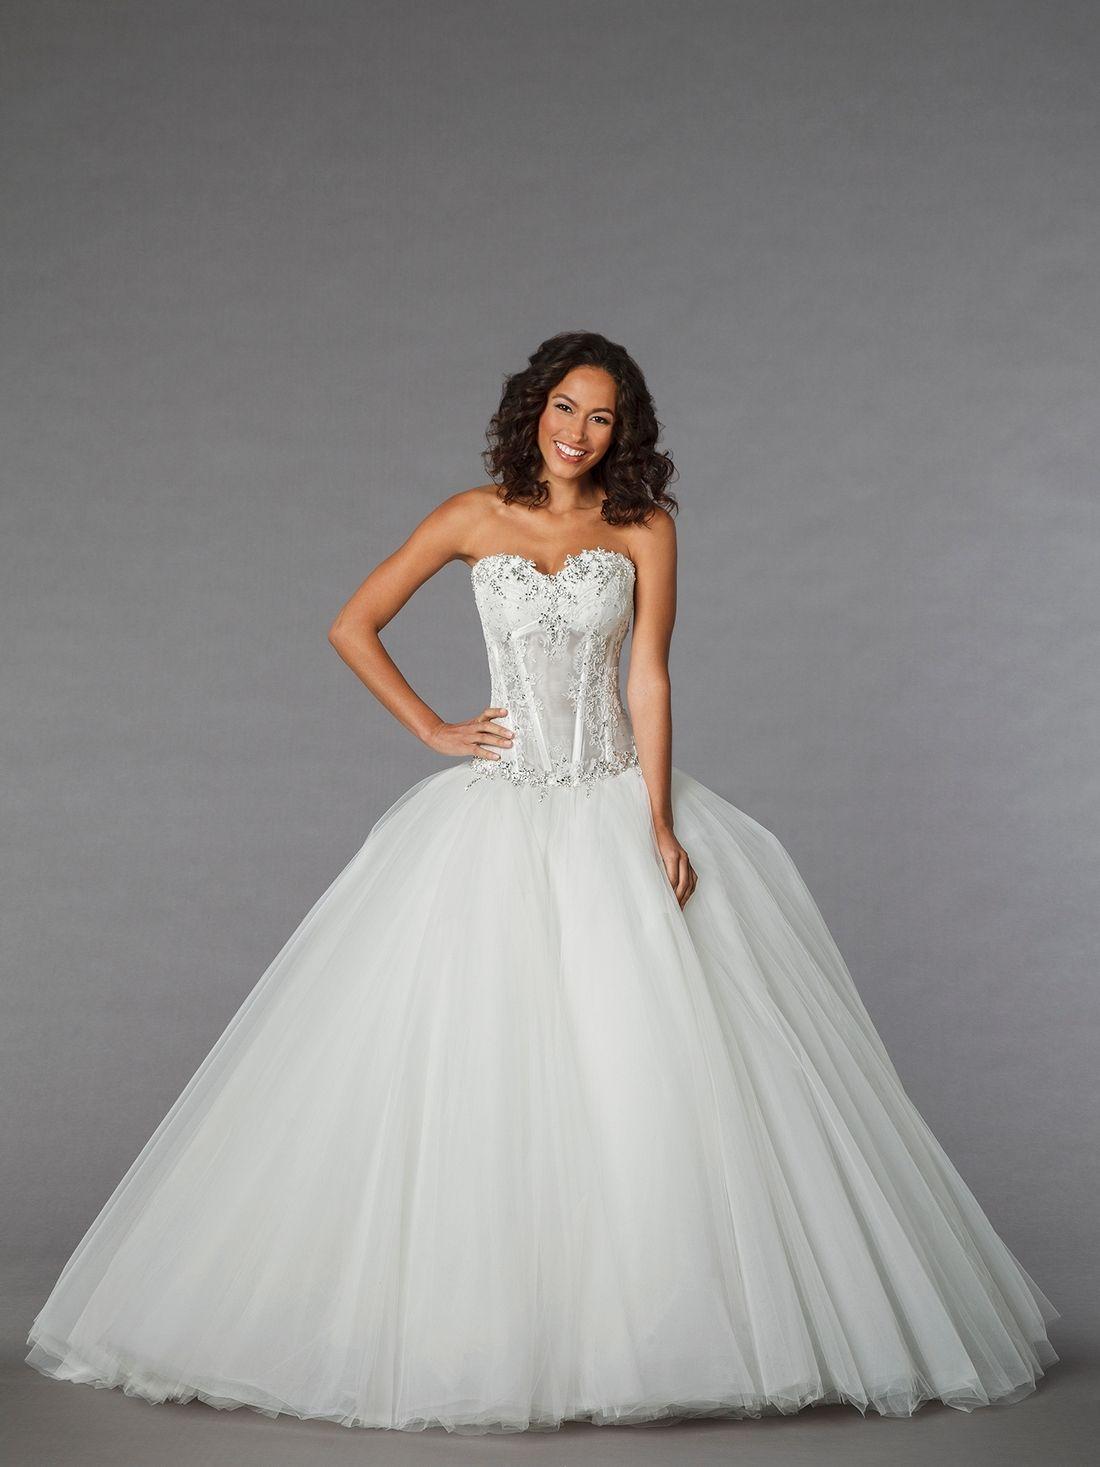 28 Most Elegant Looking Ball Gown Wedding Dresses | Wedding ...